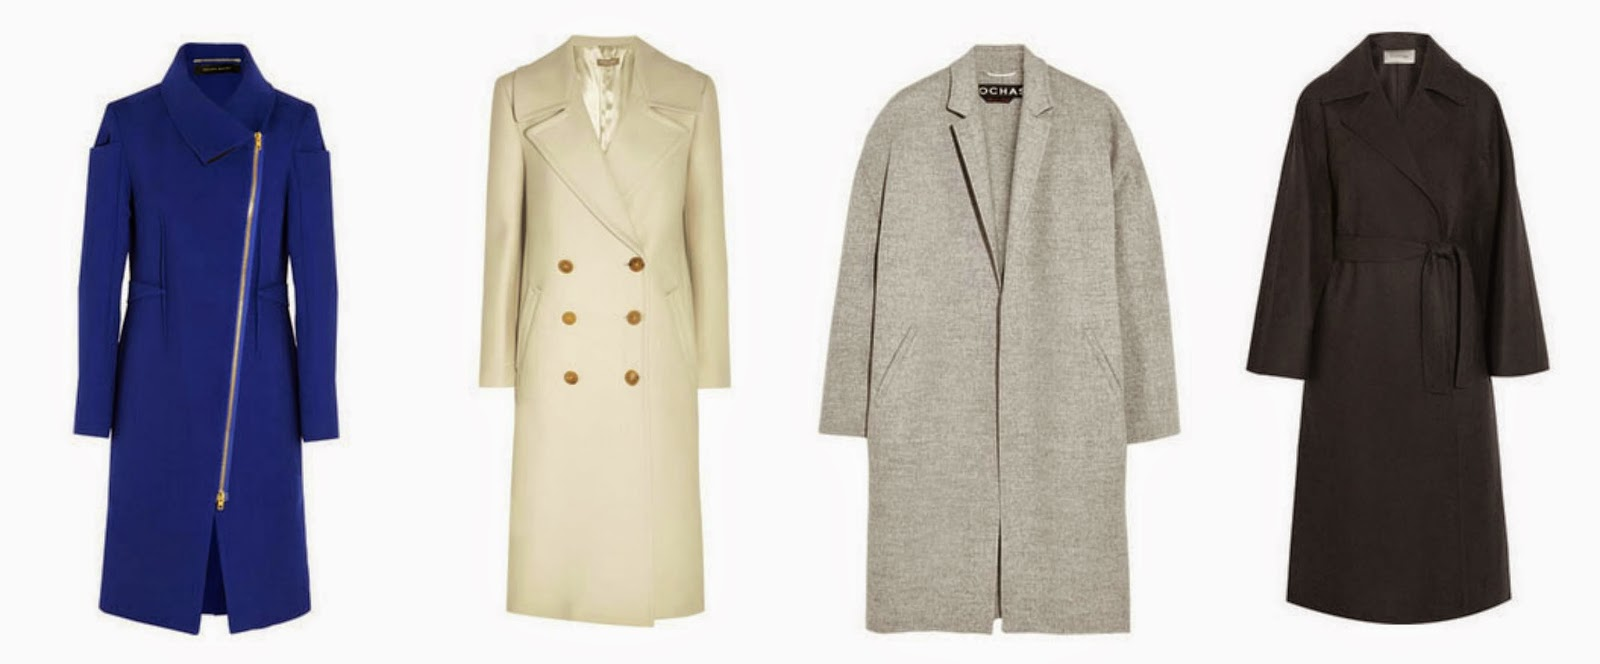 rebajas sales net a porter valentino Rochas Michael Kors Roland Mouret abrigos coats fashion